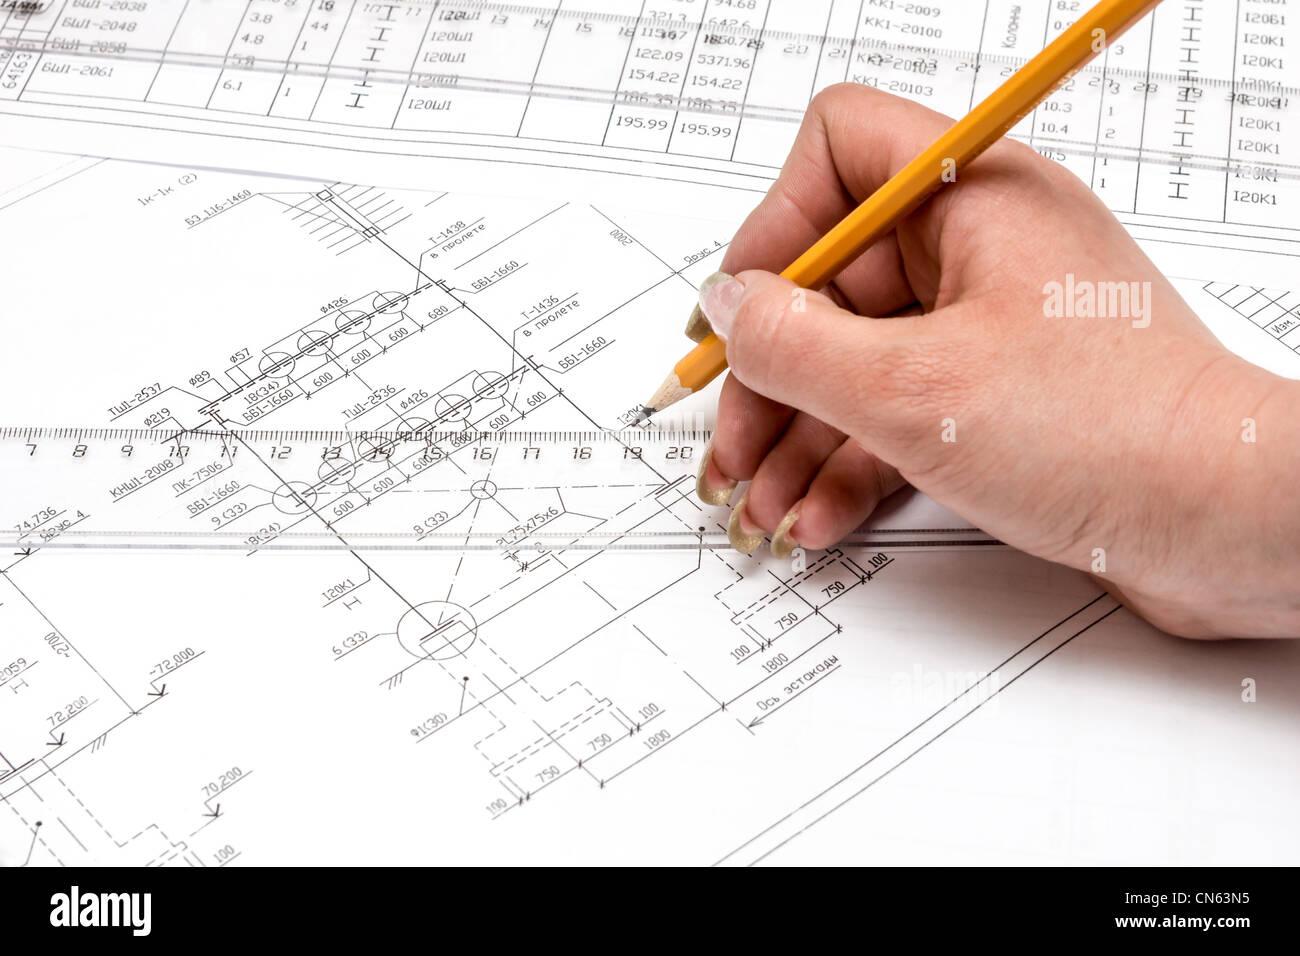 Architecture Blueprint Compass Computer Stockfotos & Architecture ...